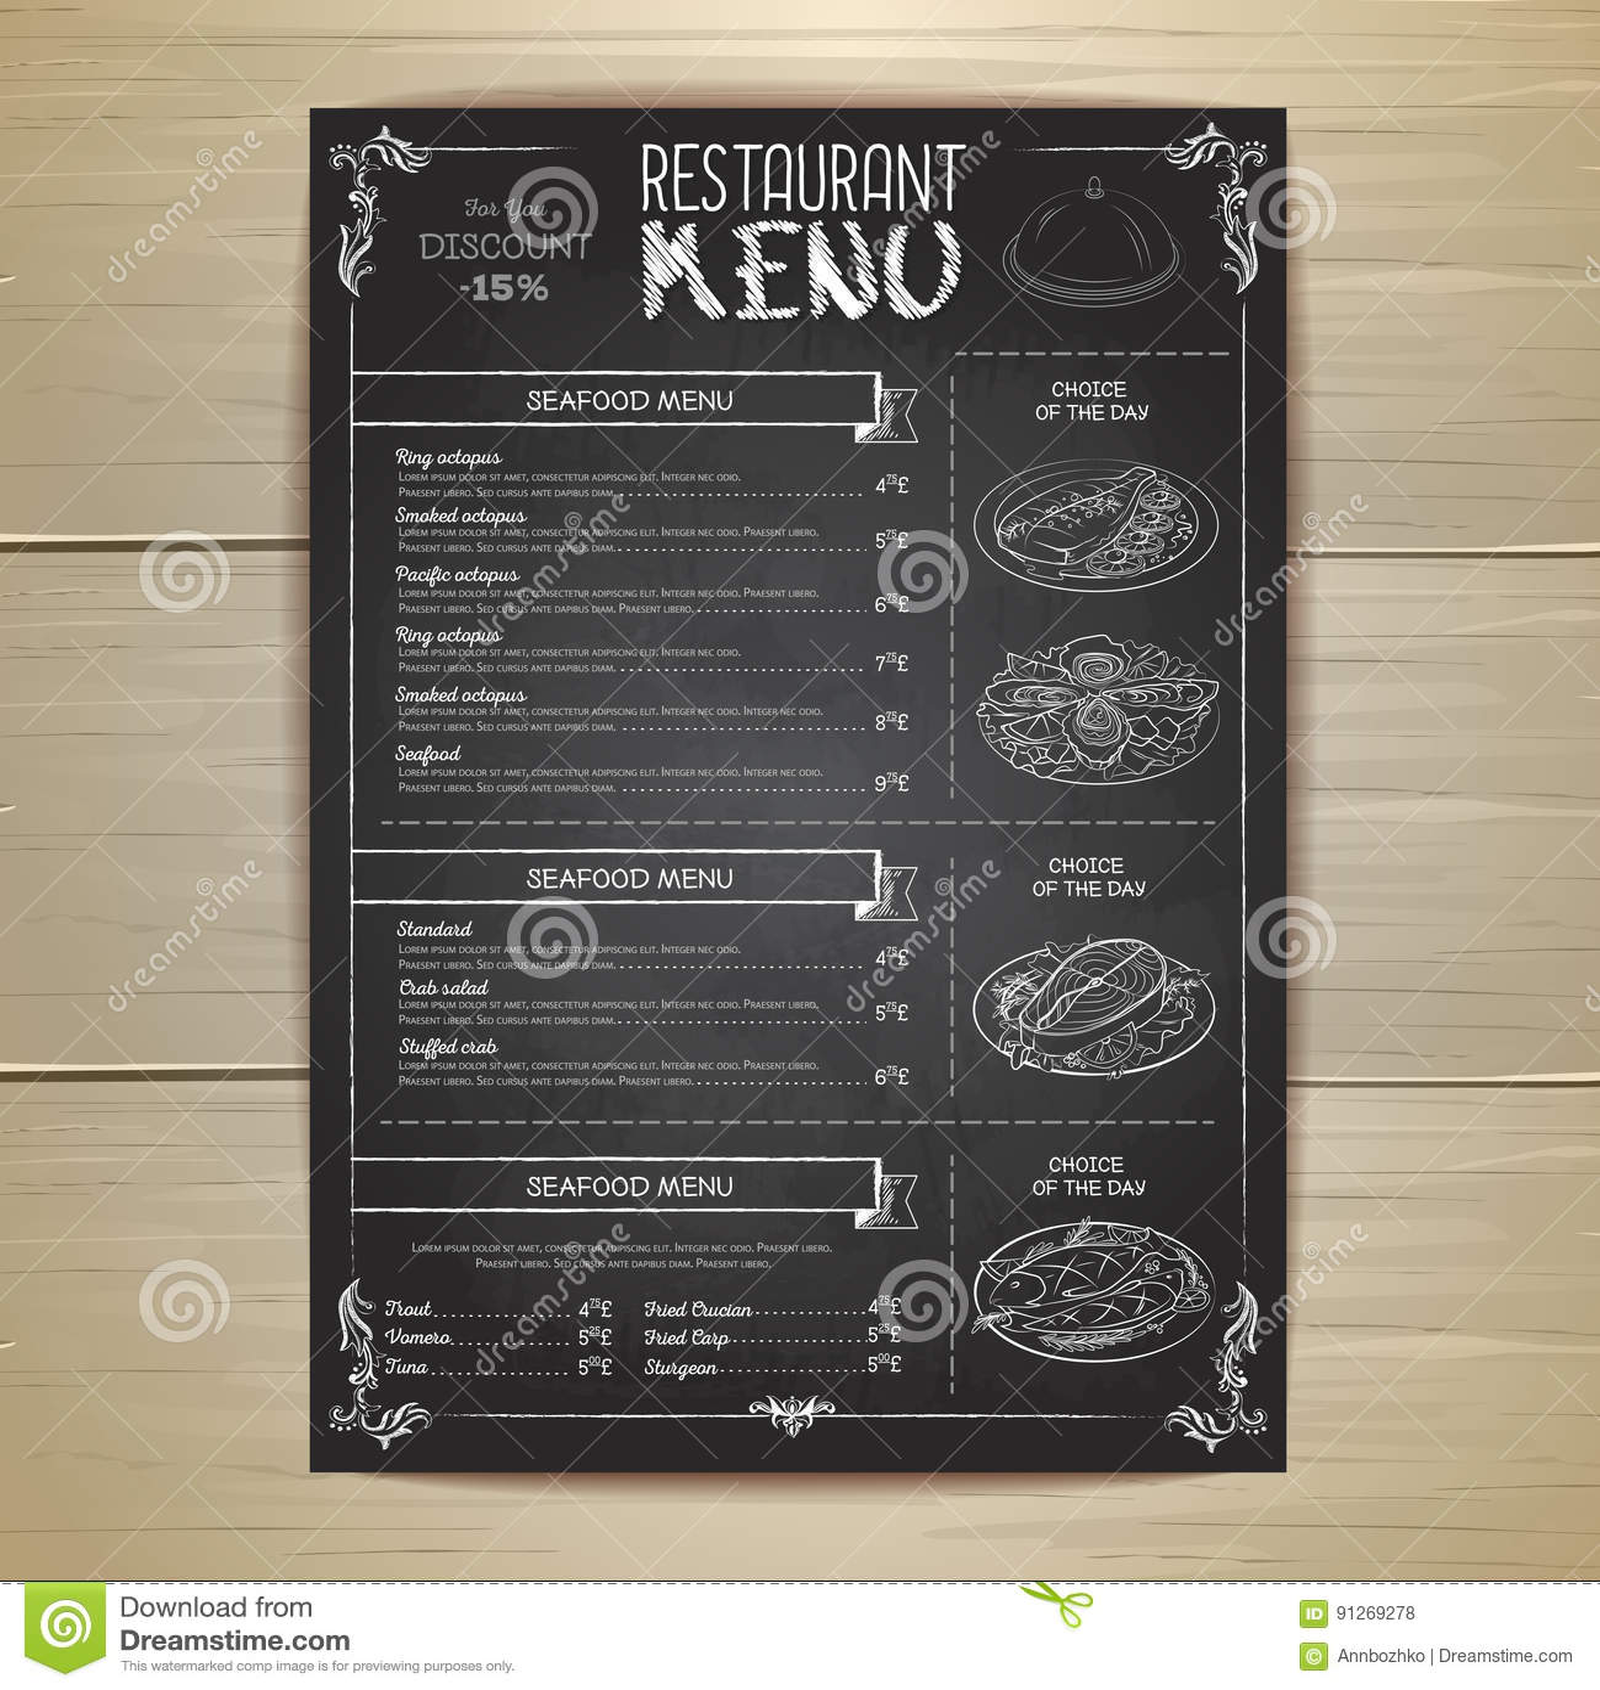 chalk drawing restaurant menu design stock vector illustration of